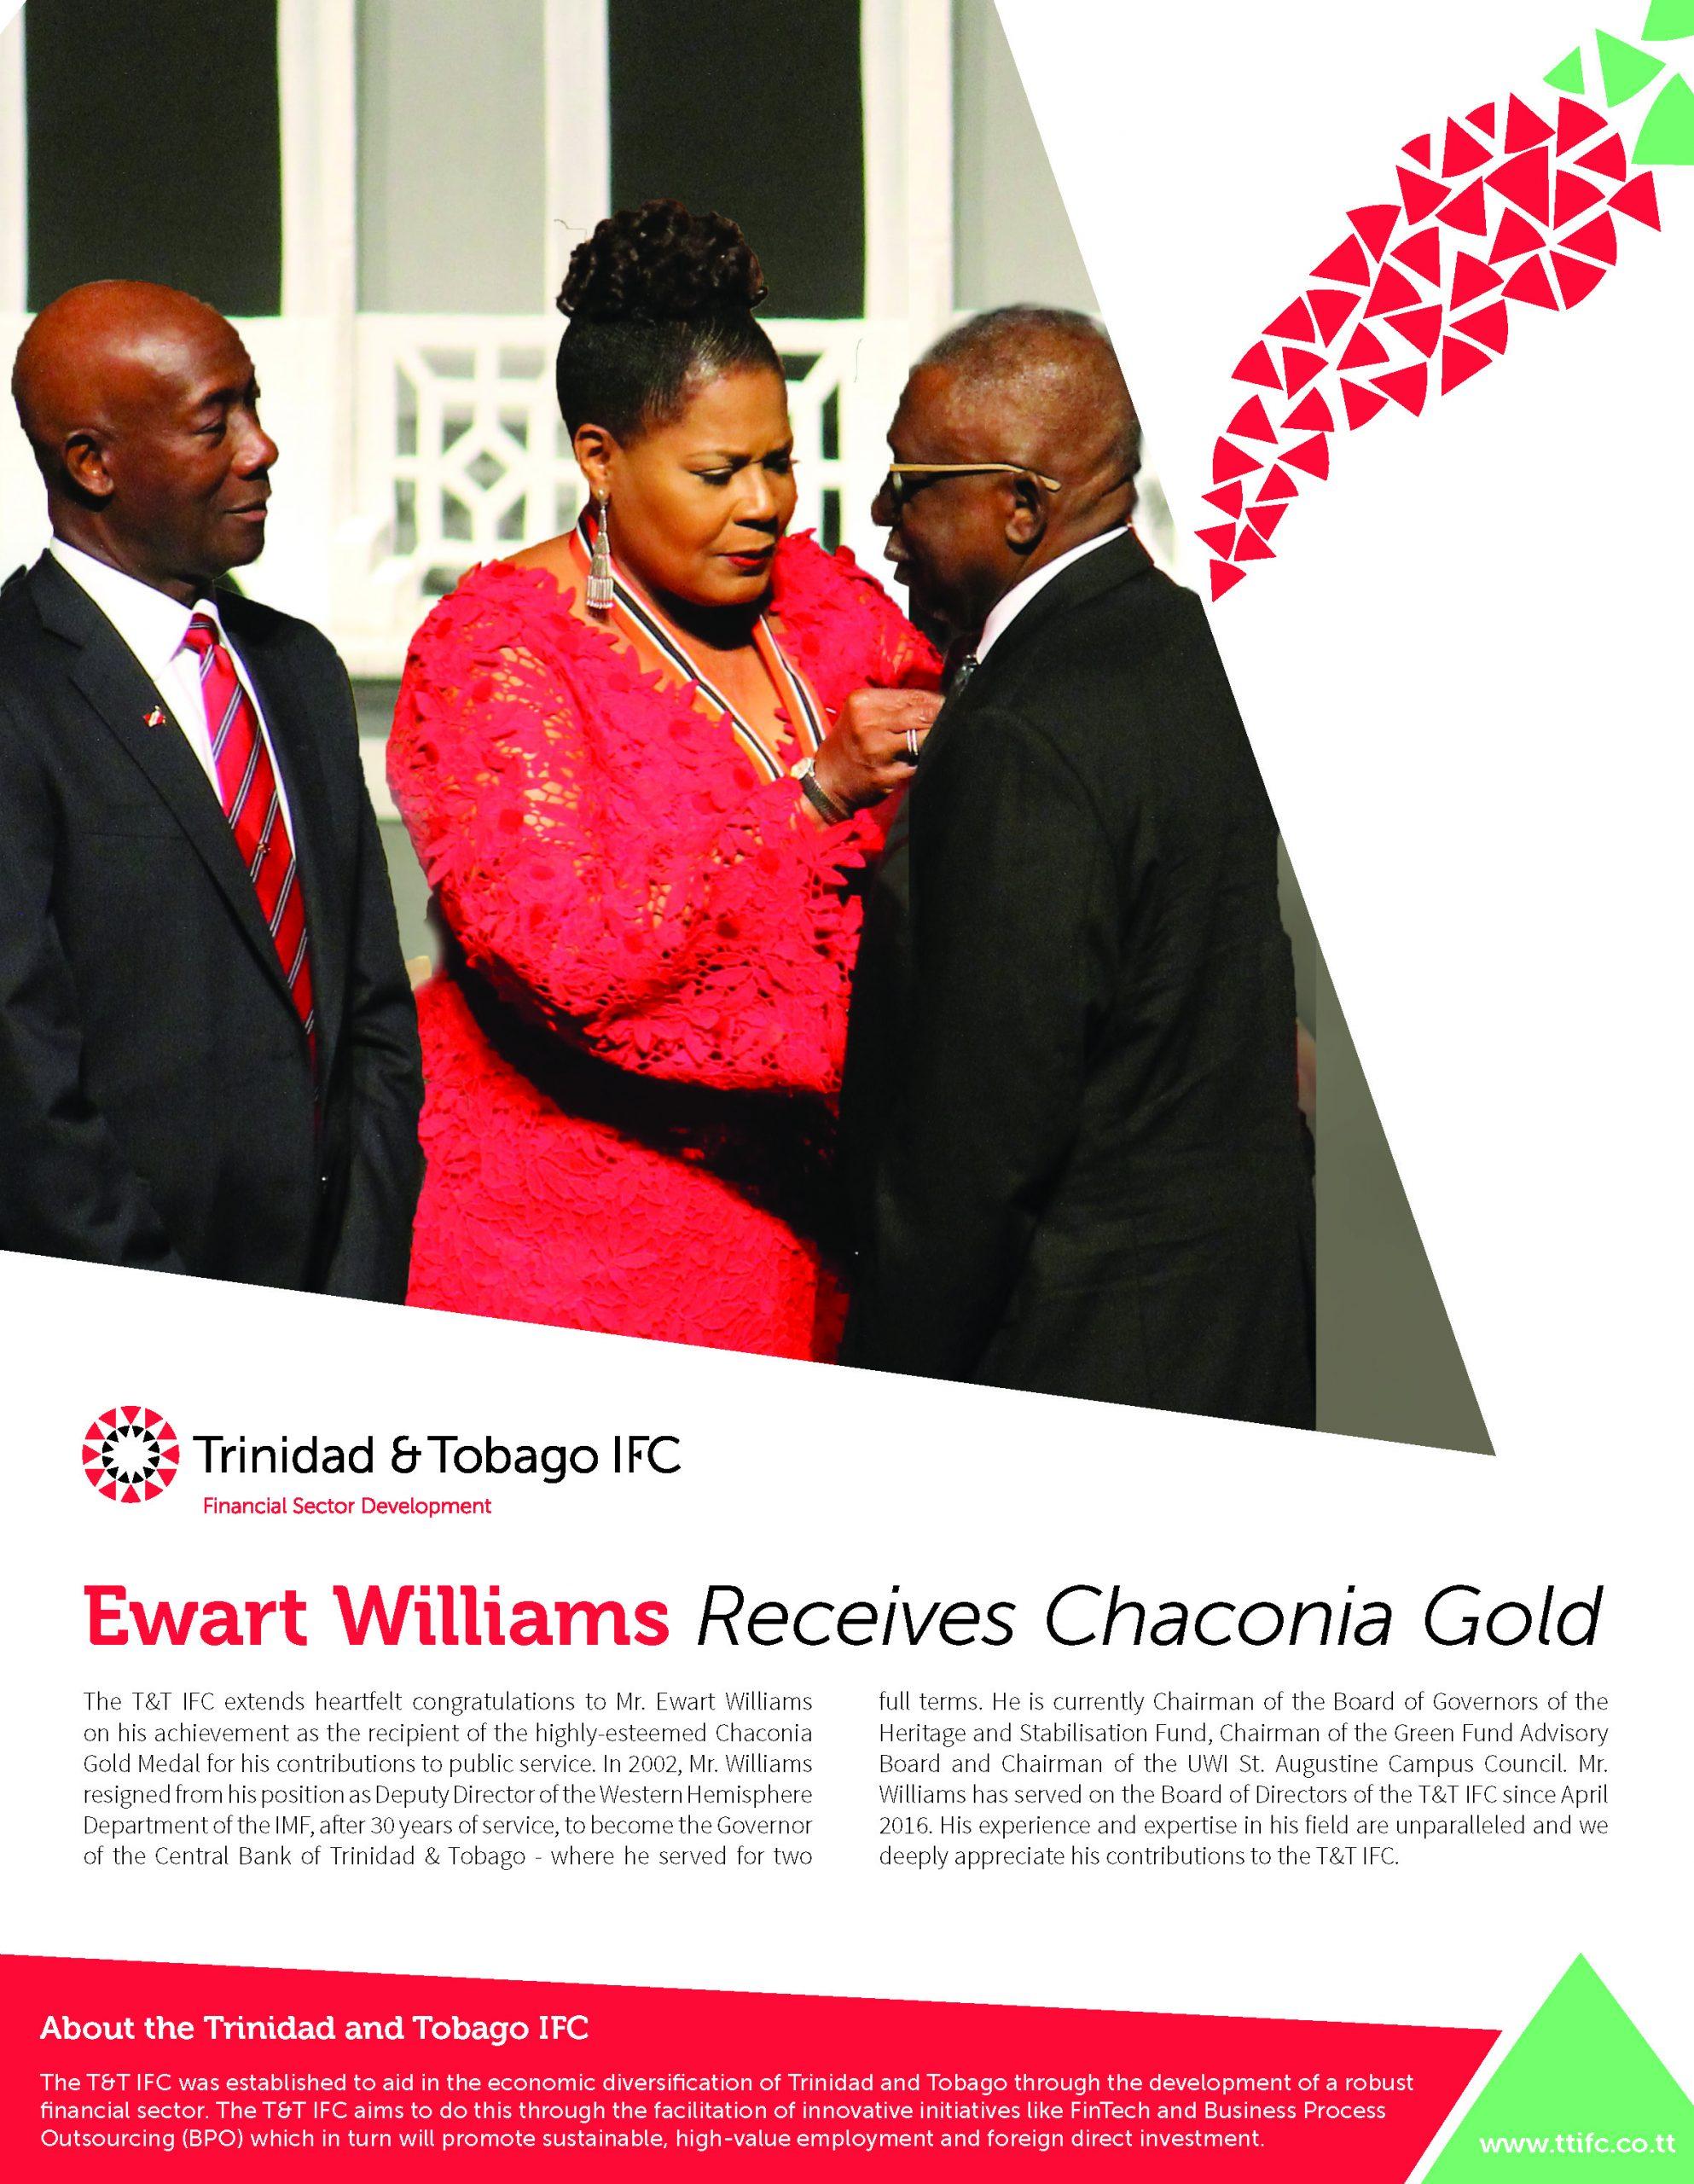 TTIFC's Ewart Williams Receives Chaconia Gold